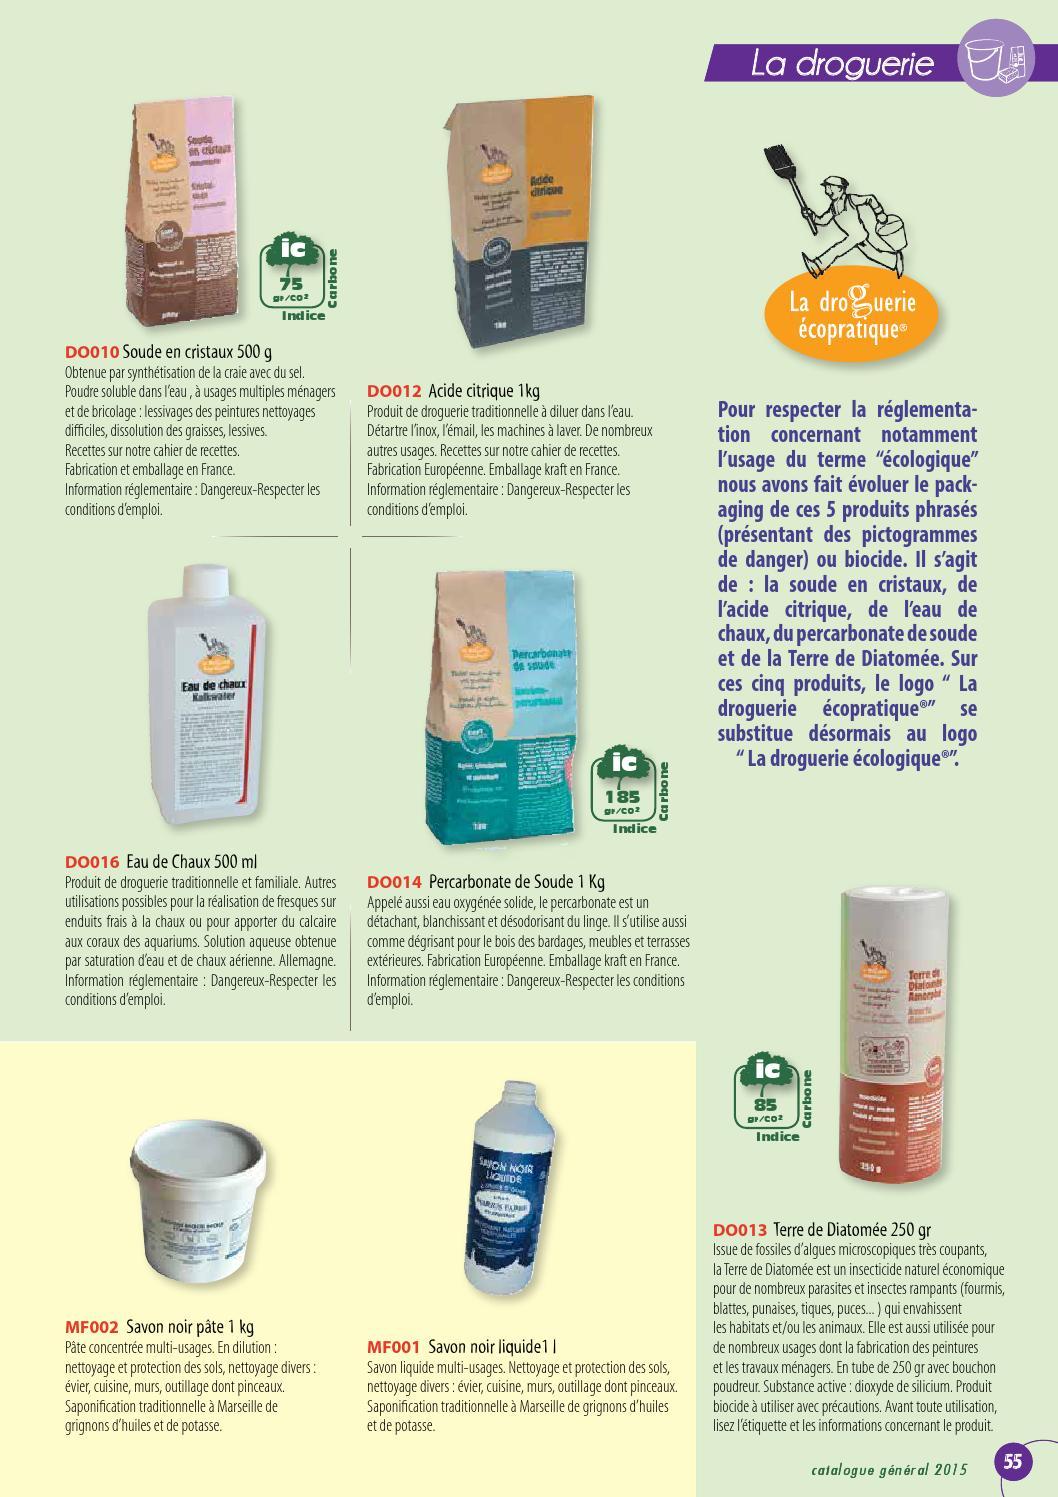 Percarbonate De Sodium Pour Terrasse Bois catalogue general 2015 webecodis - issuu